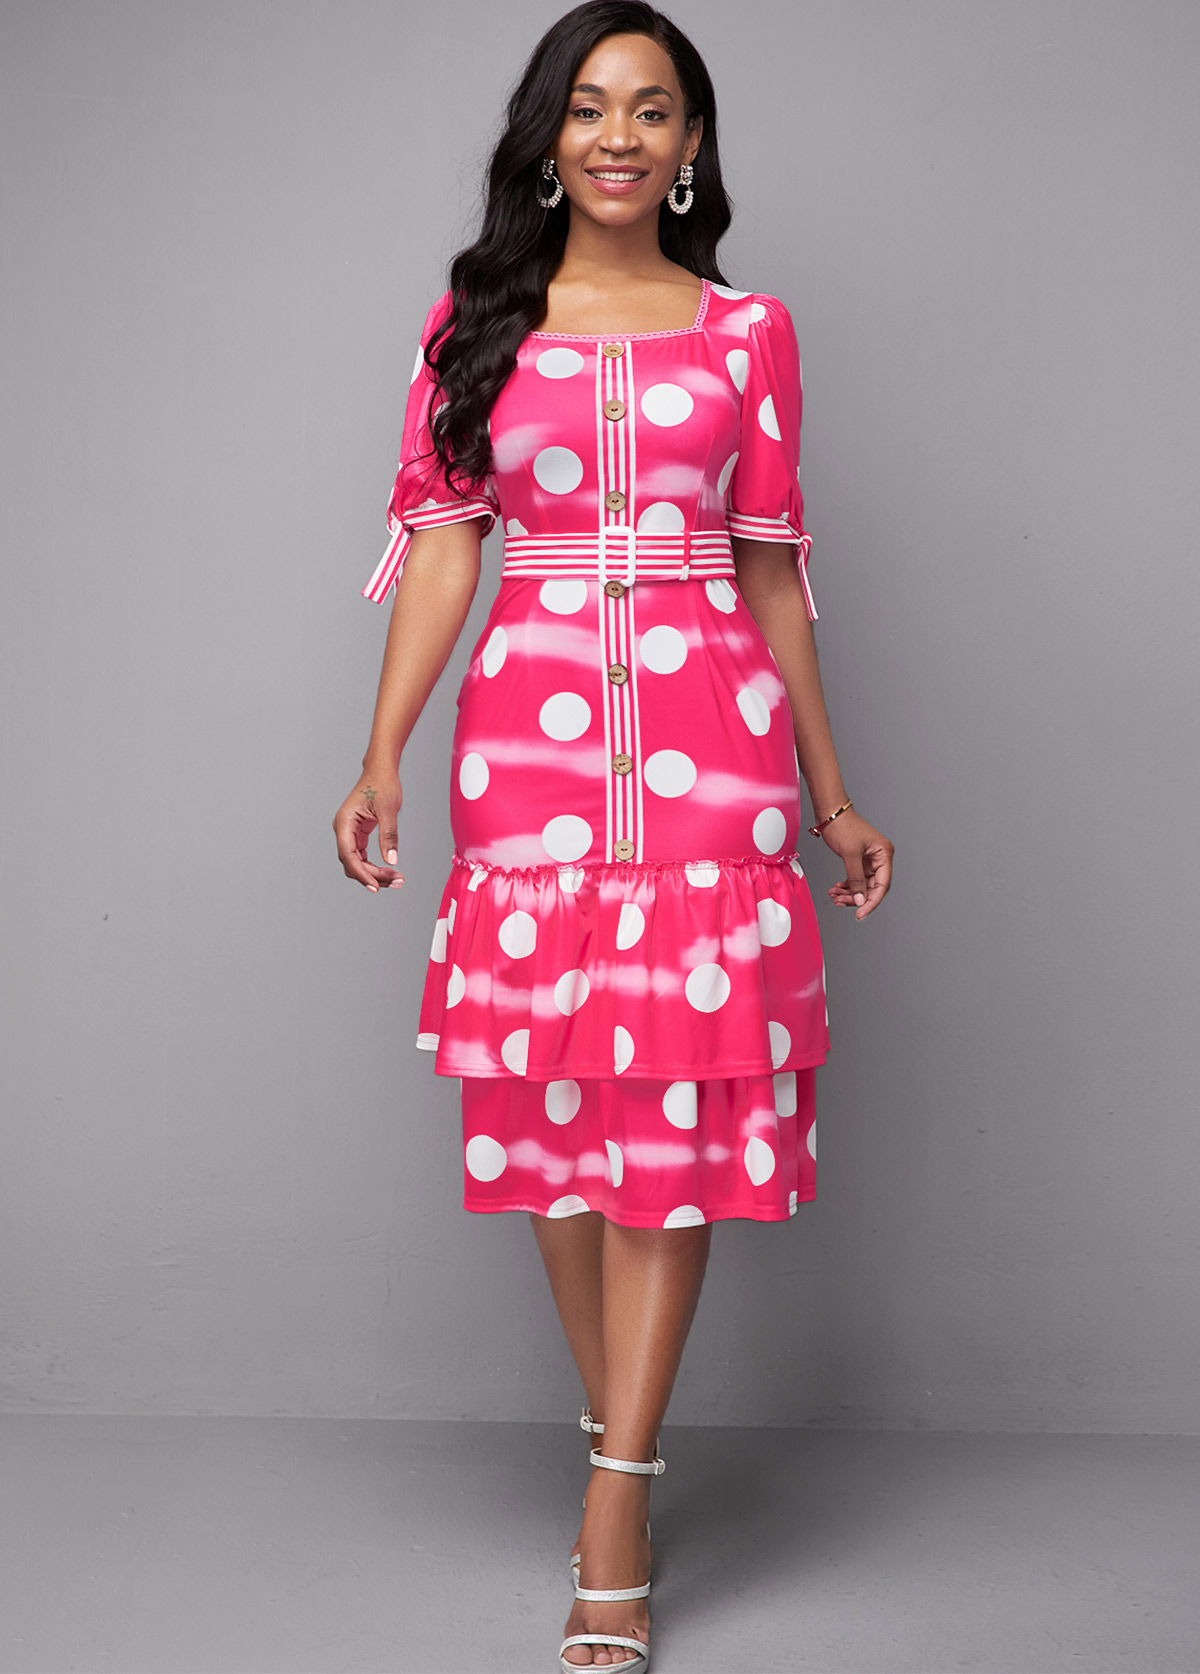 Layered Short Sleeve Polka Dot Print Dress